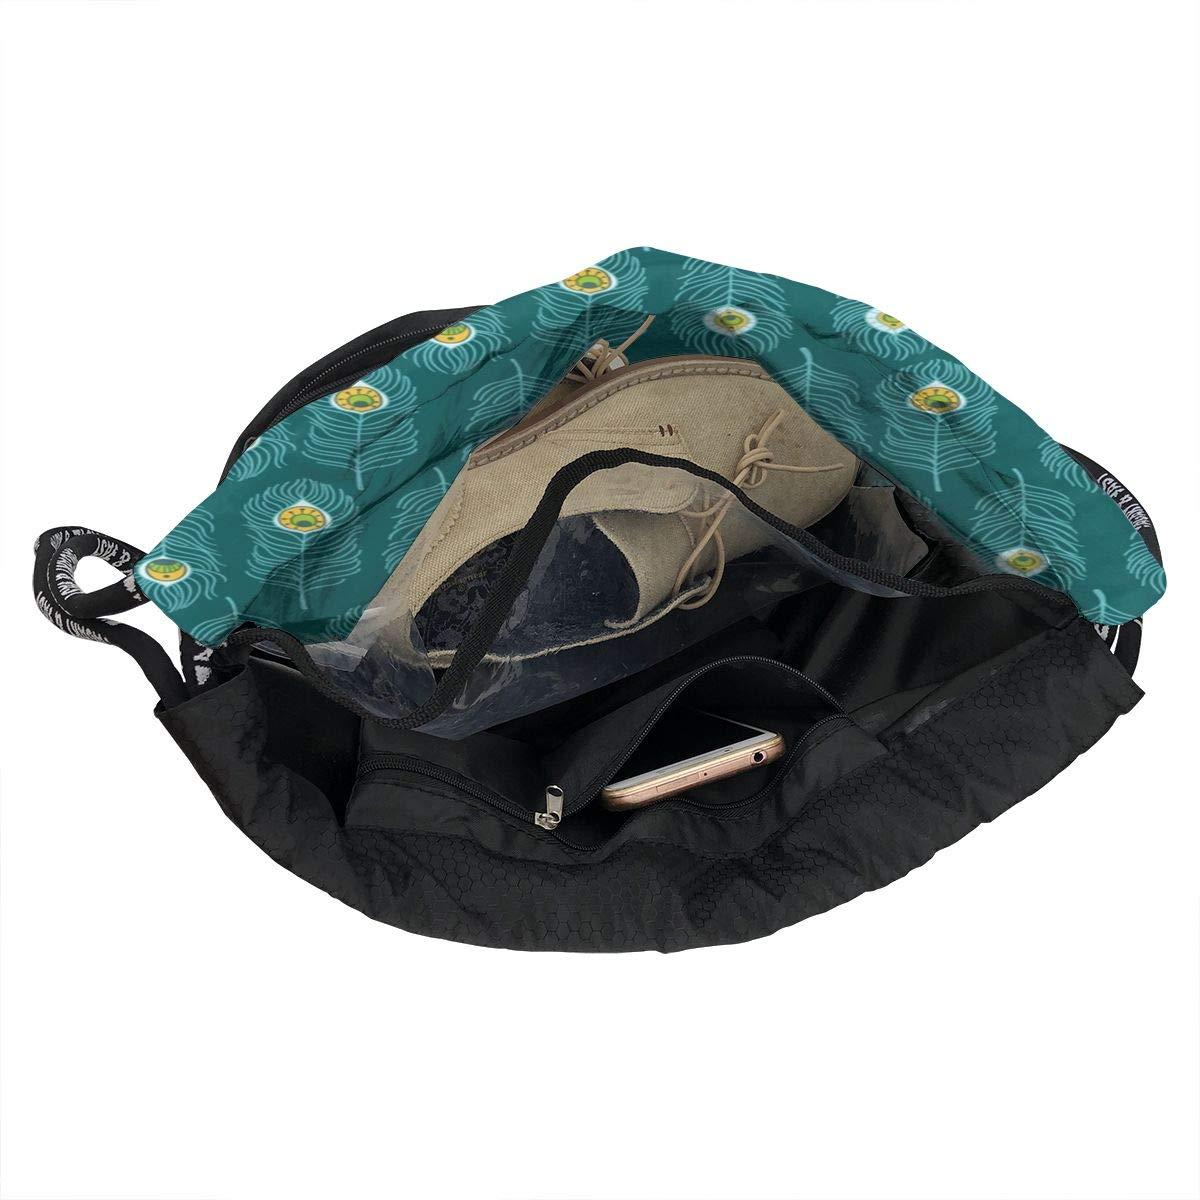 HUOPR5Q Hand-Drawn-Peacock-Feather Drawstring Backpack Sport Gym Sack Shoulder Bulk Bag Dance Bag for School Travel